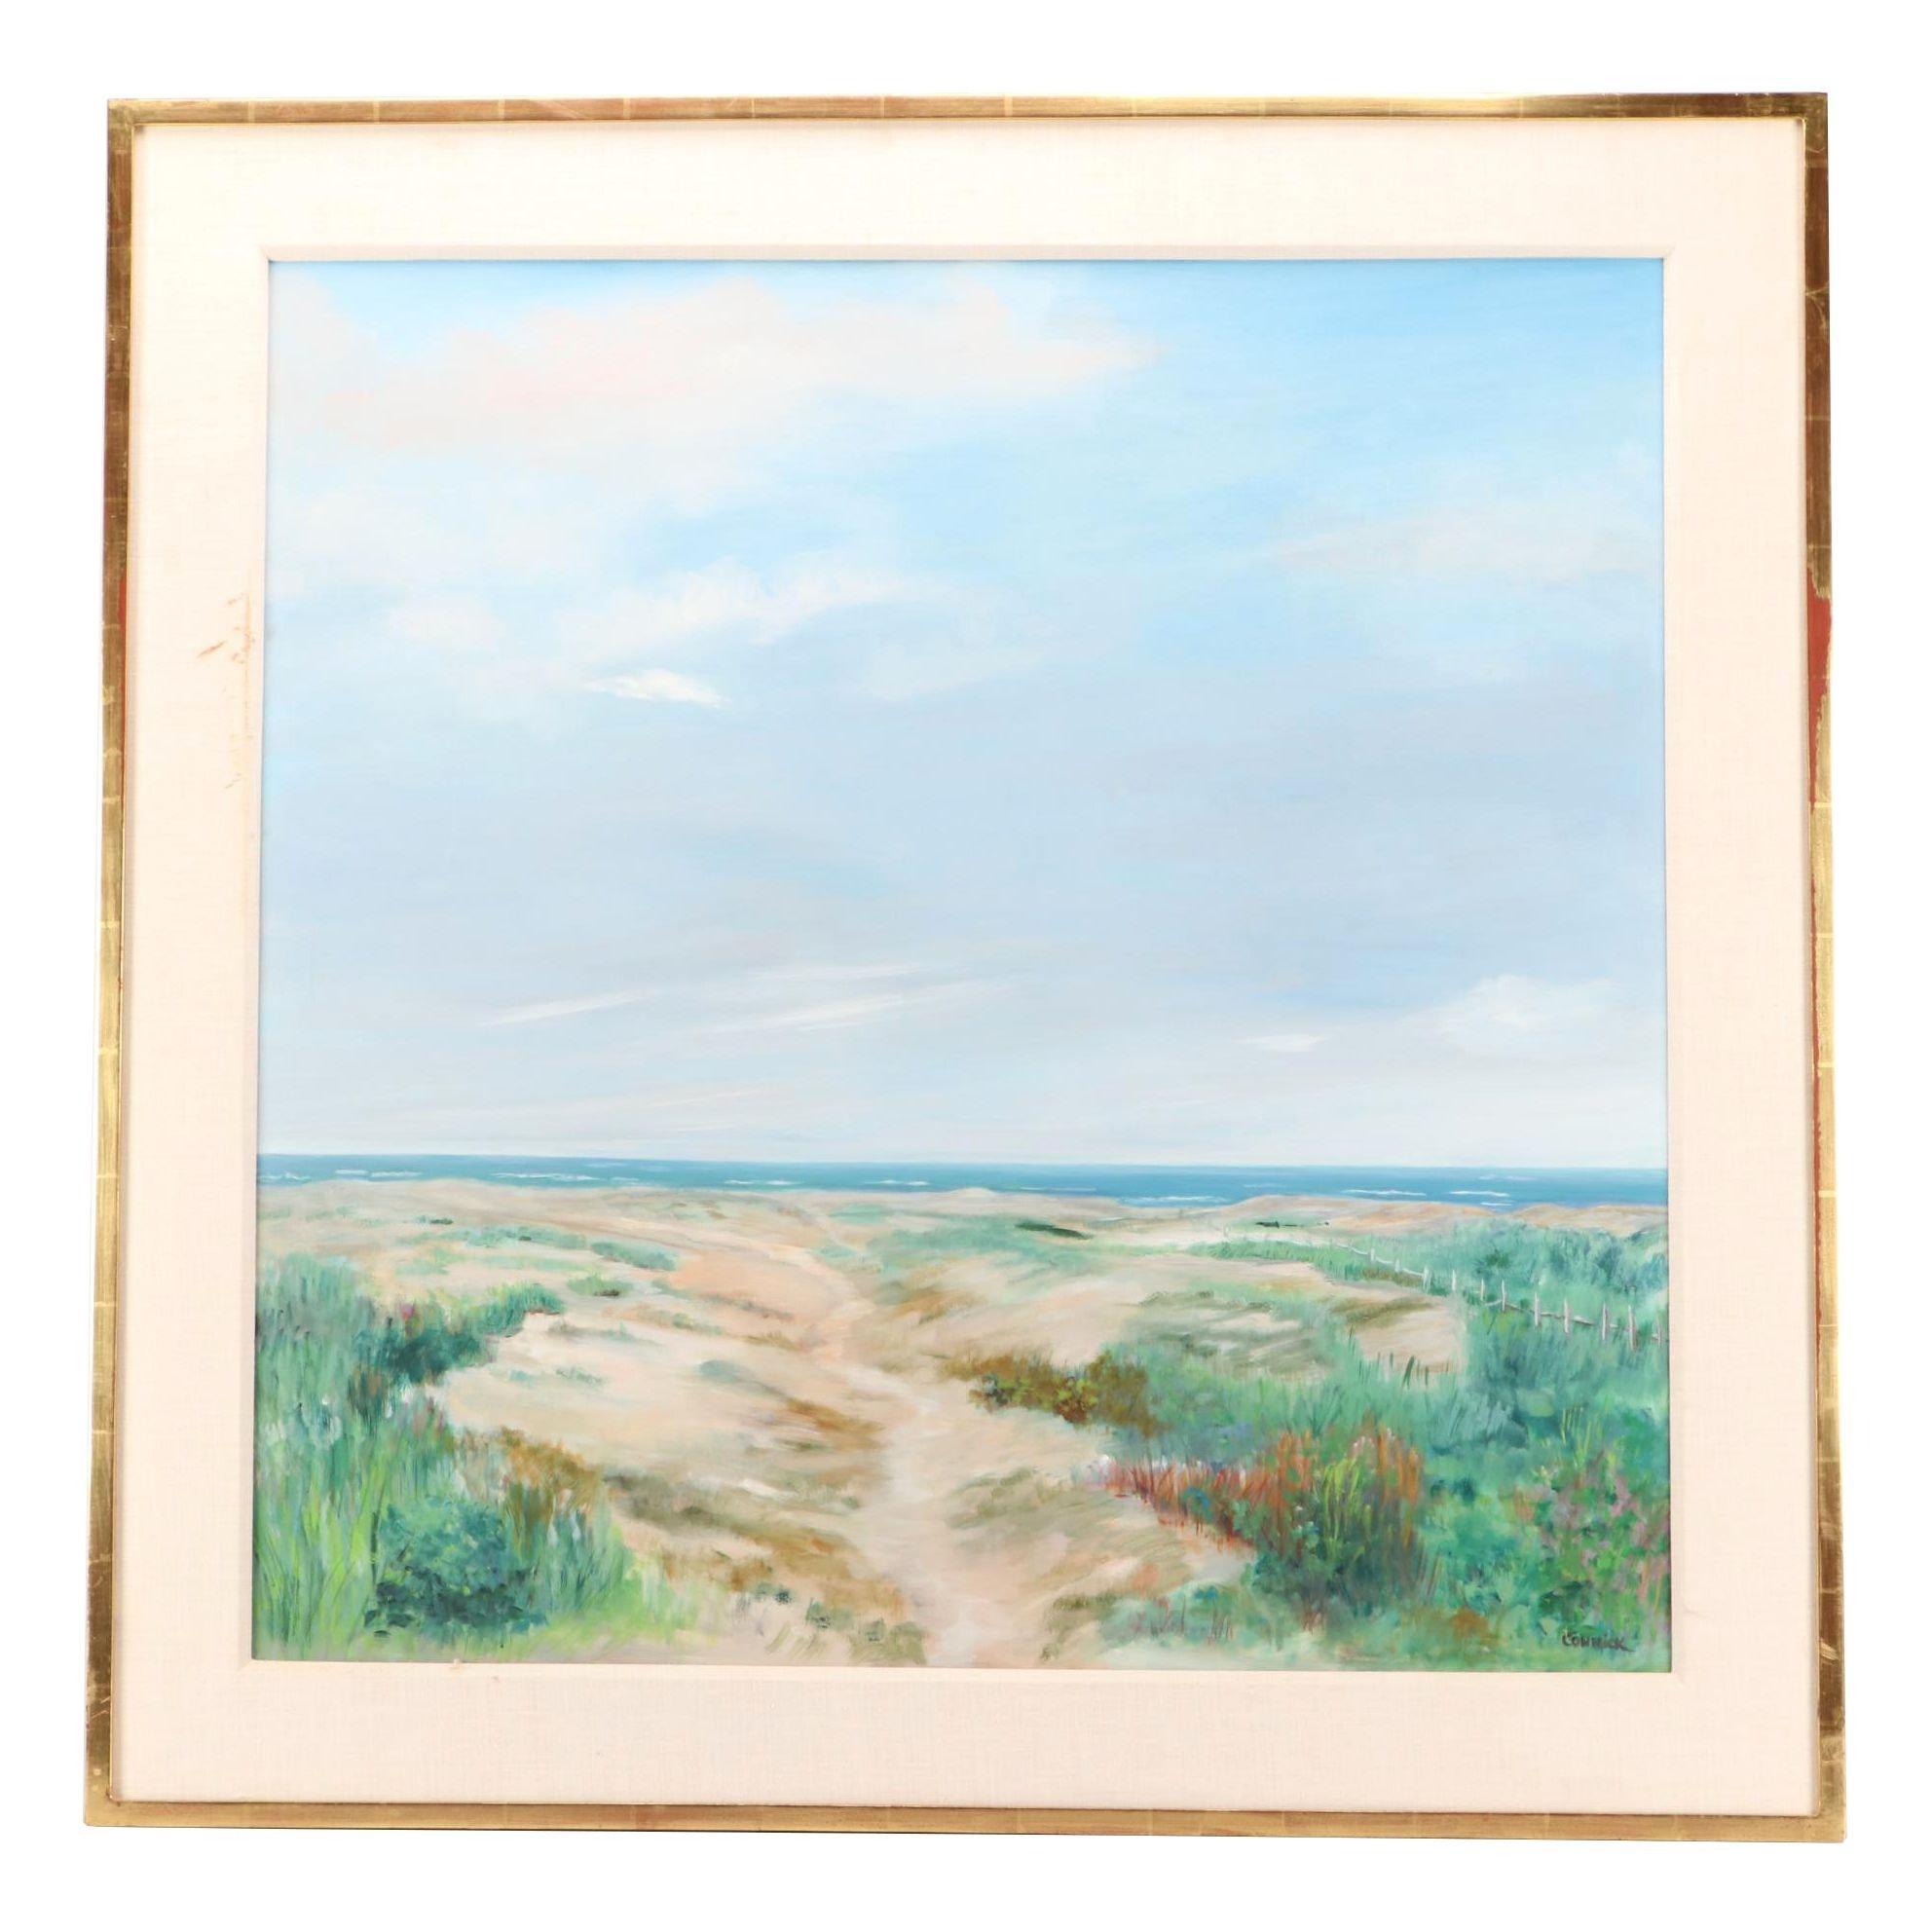 Connick Coastal Landscape Oil Painting